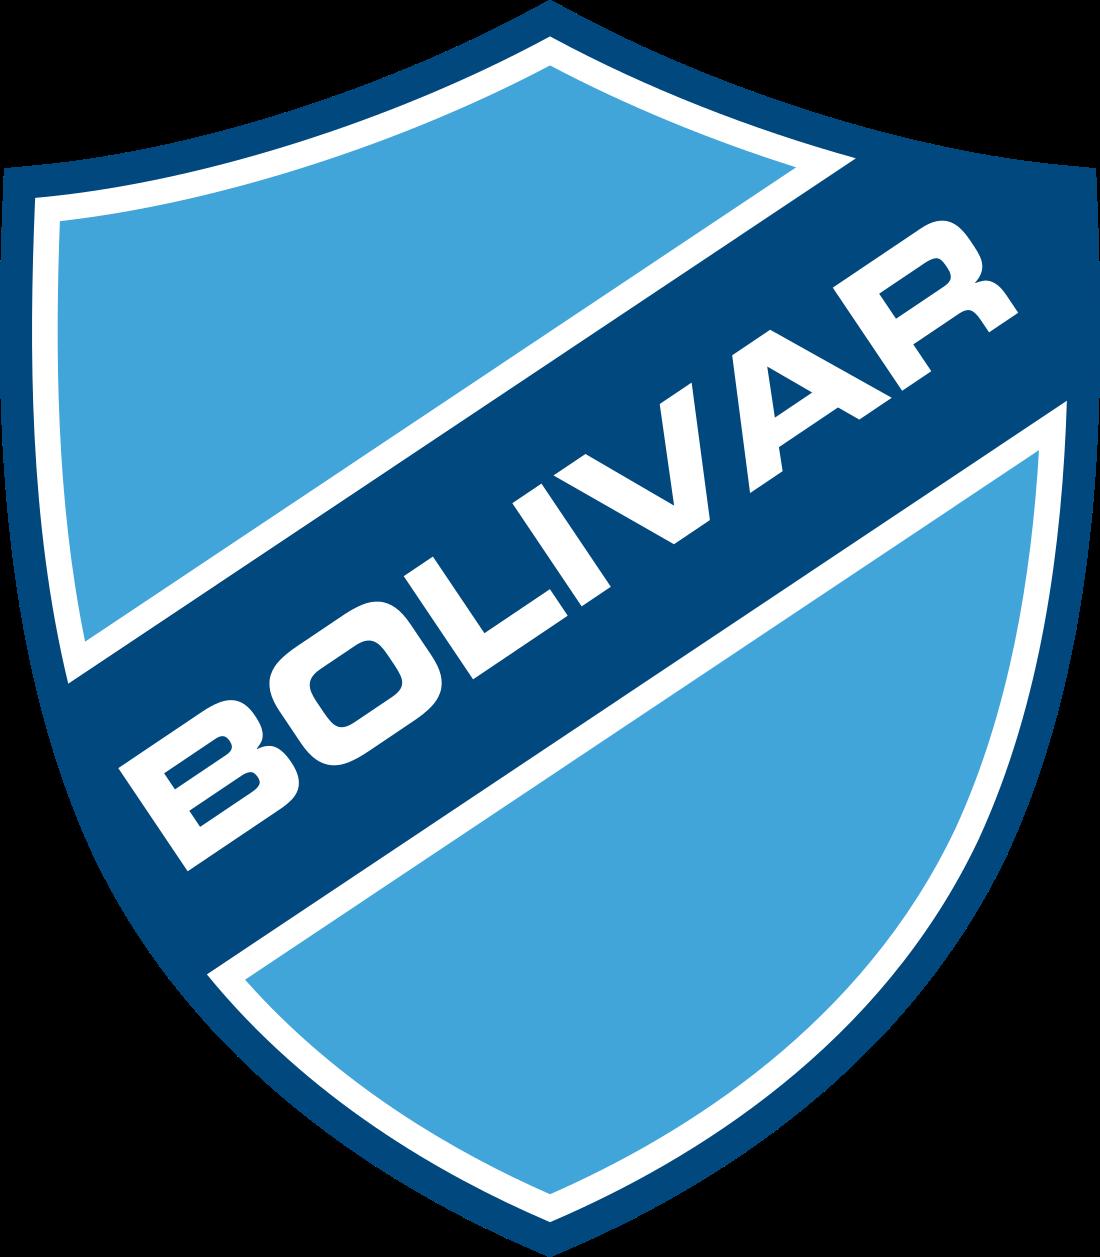 club bolívar logo 3 - Club Bolívar Logo - Escudo